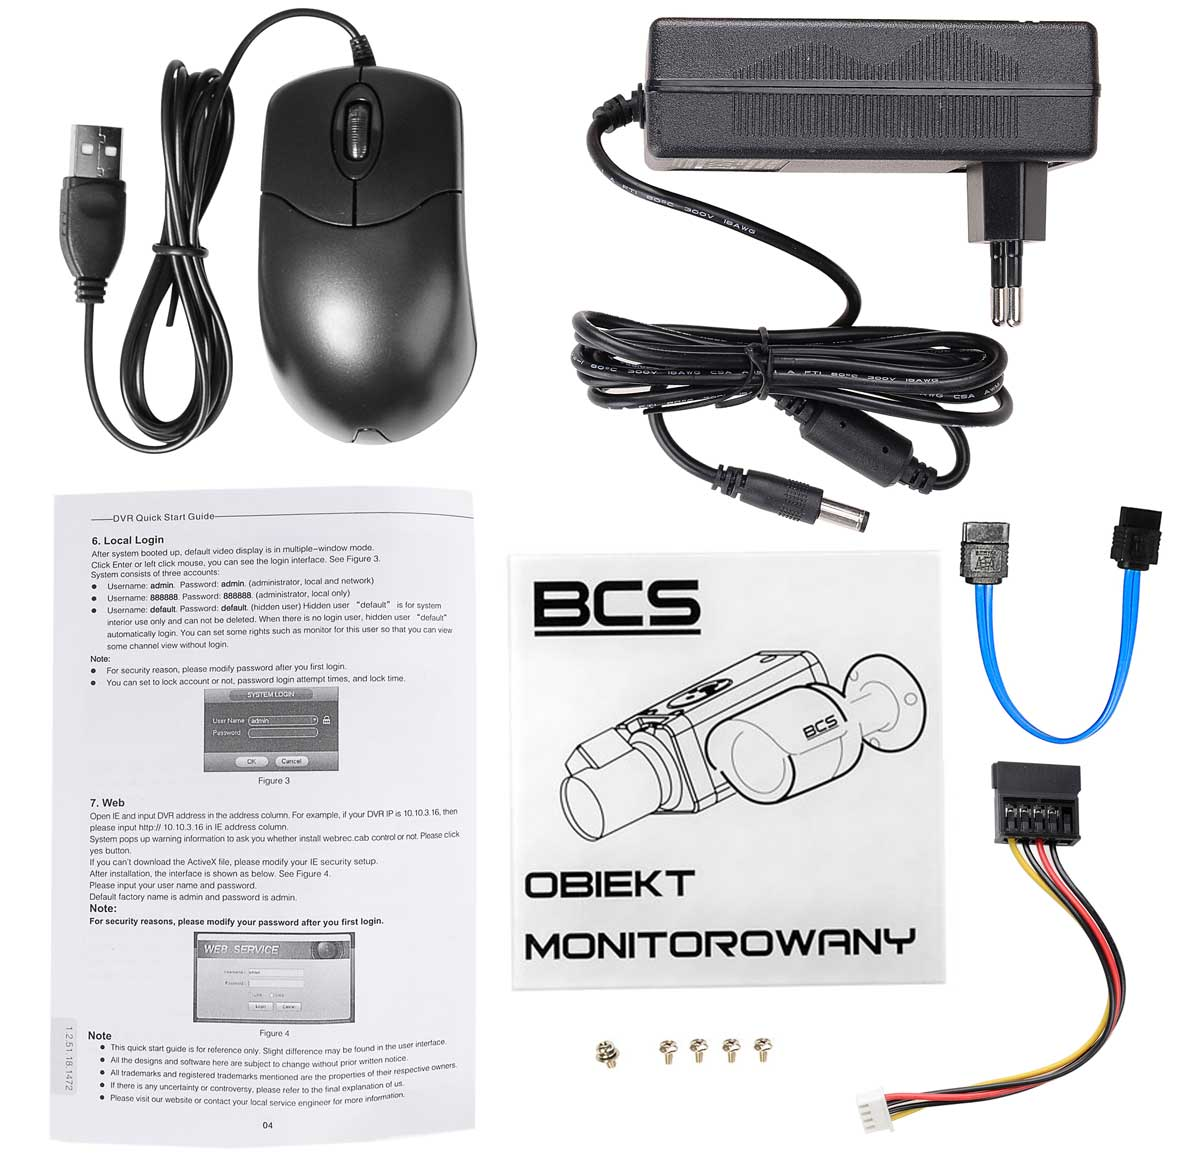 Akcesoria rejestratora BCS-CVR16014M